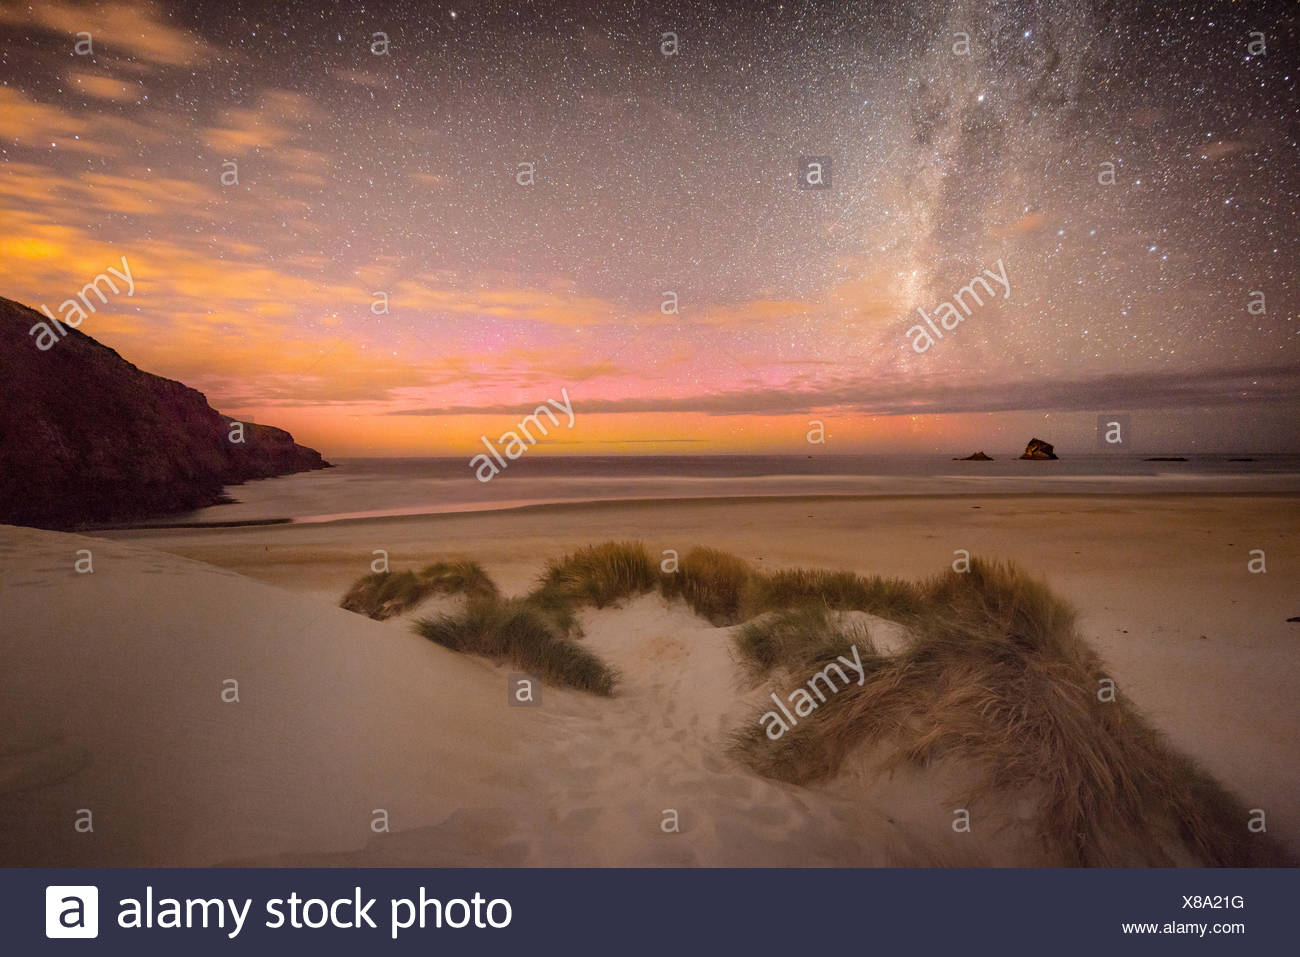 Southern lights, aurora australis with Milky Way above the sea, sand dunes, Sandfly Bay, Dunedin, Otago, Otago Peninsula - Stock Image